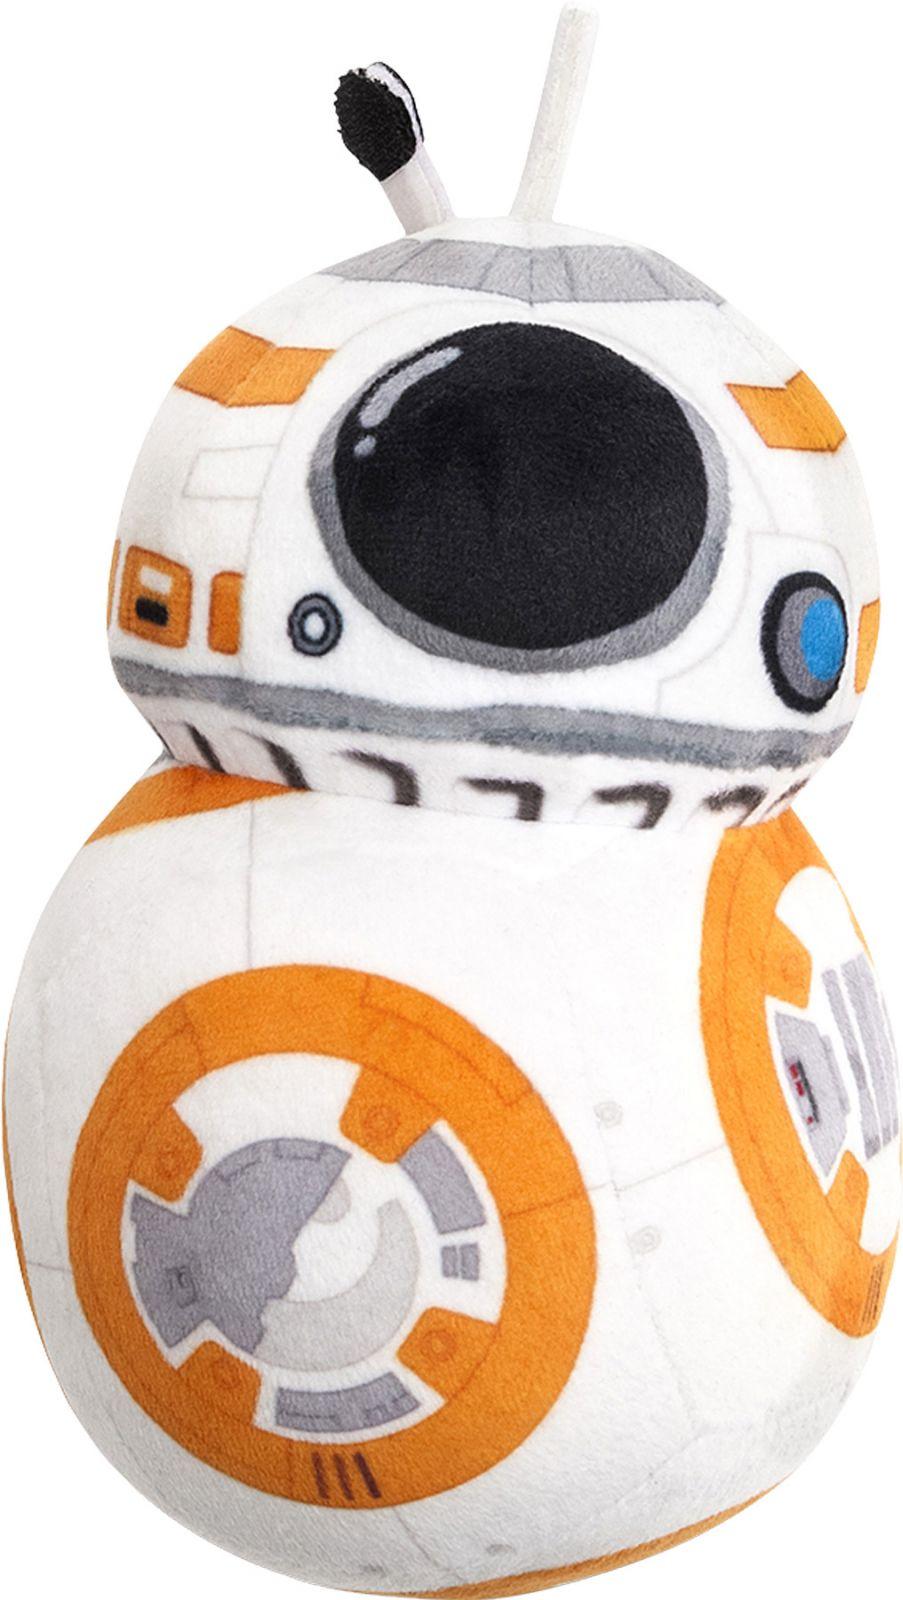 Dřevěné hračky Small Foot Star Wars plyšový BB-8 Small foot by Legler